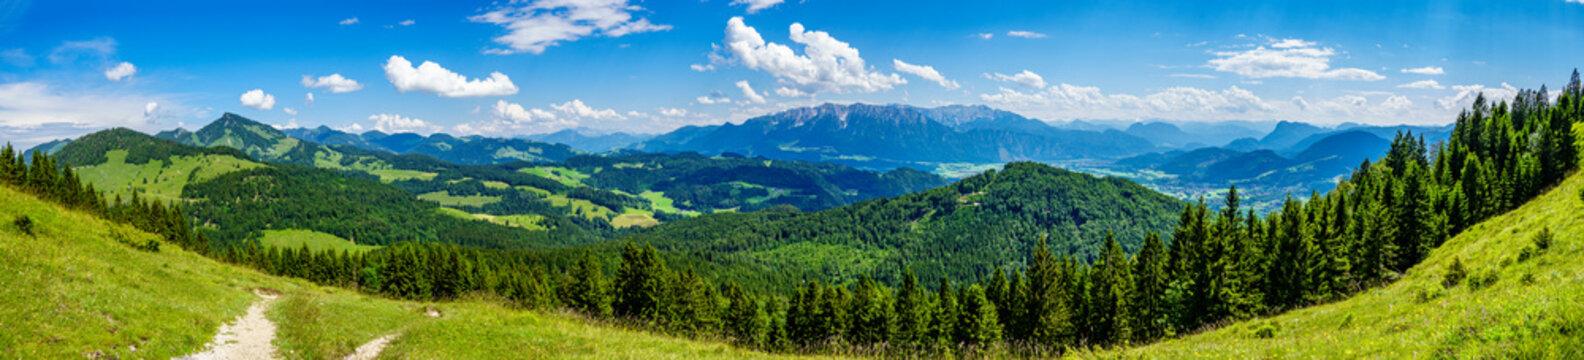 view at the kranzhorn mountain - austria